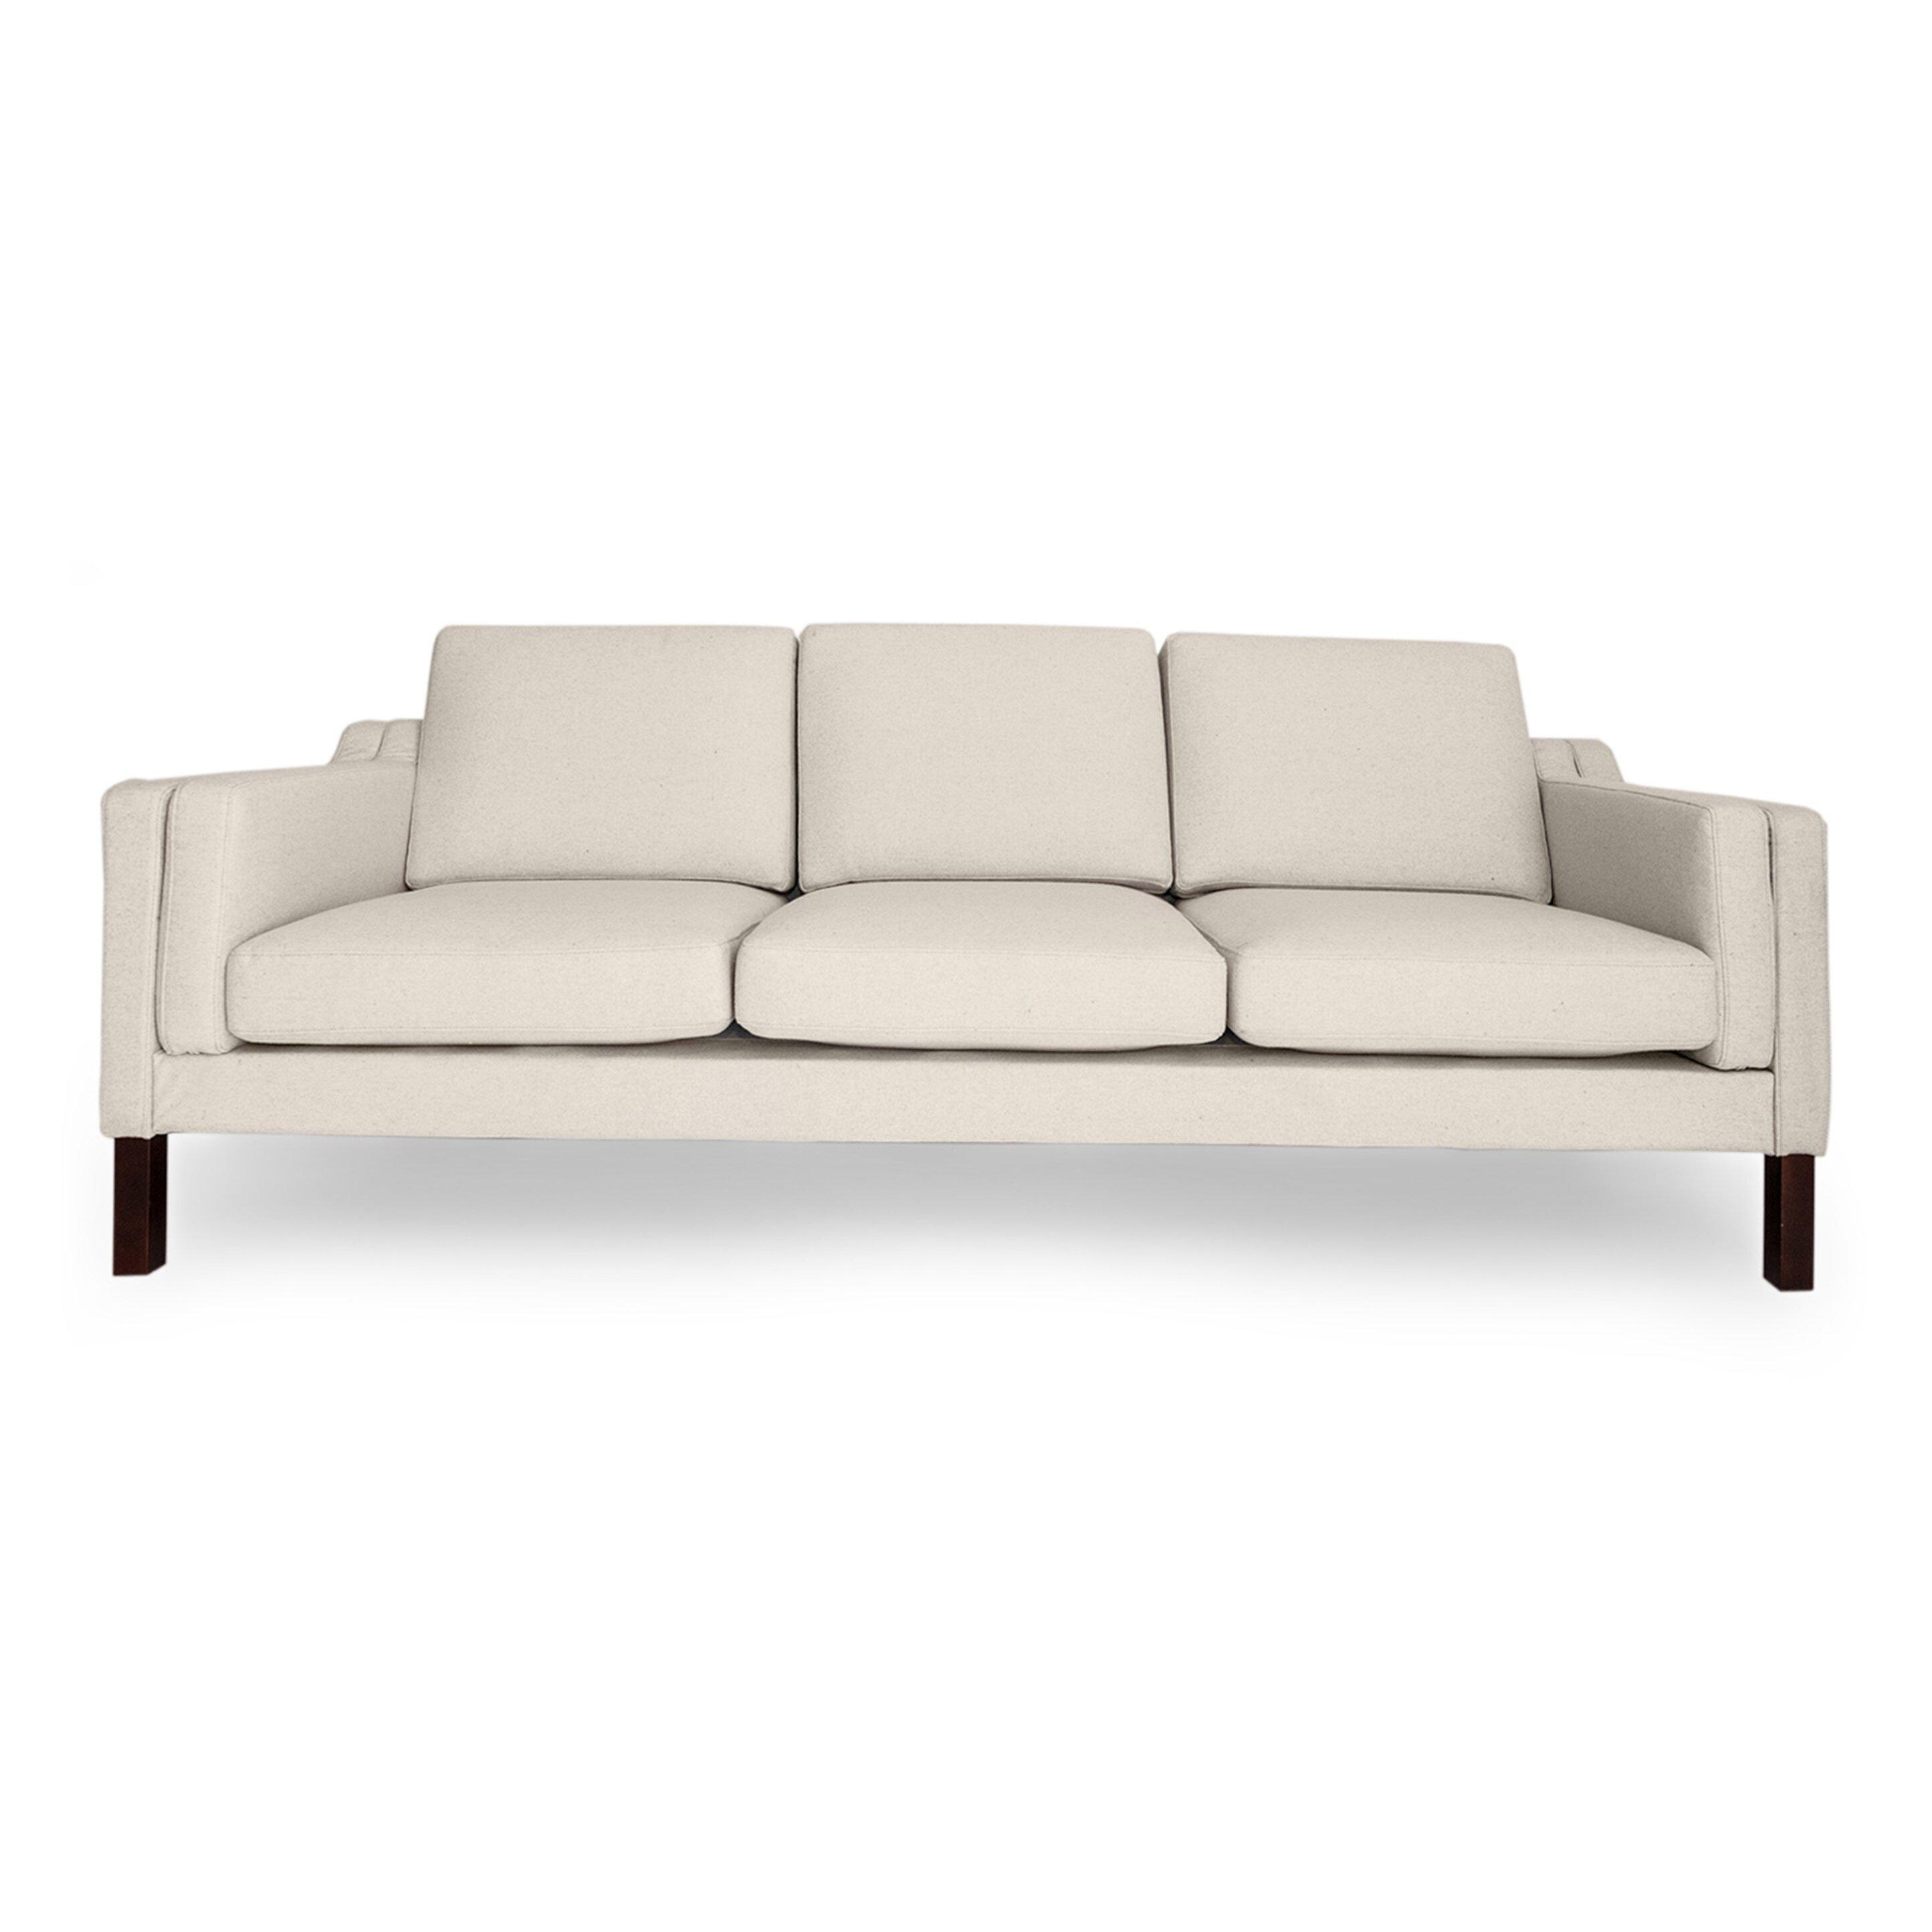 monroe mid century modern sofa by kardiel